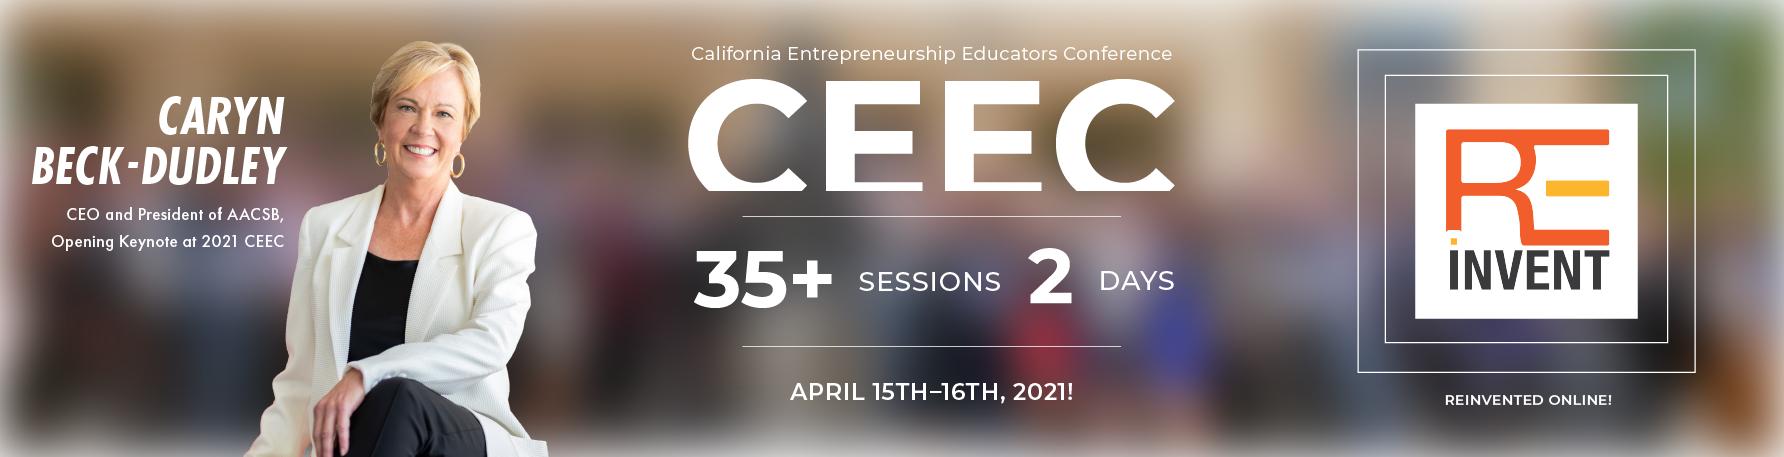 California Entrepreneurship Educators Conference